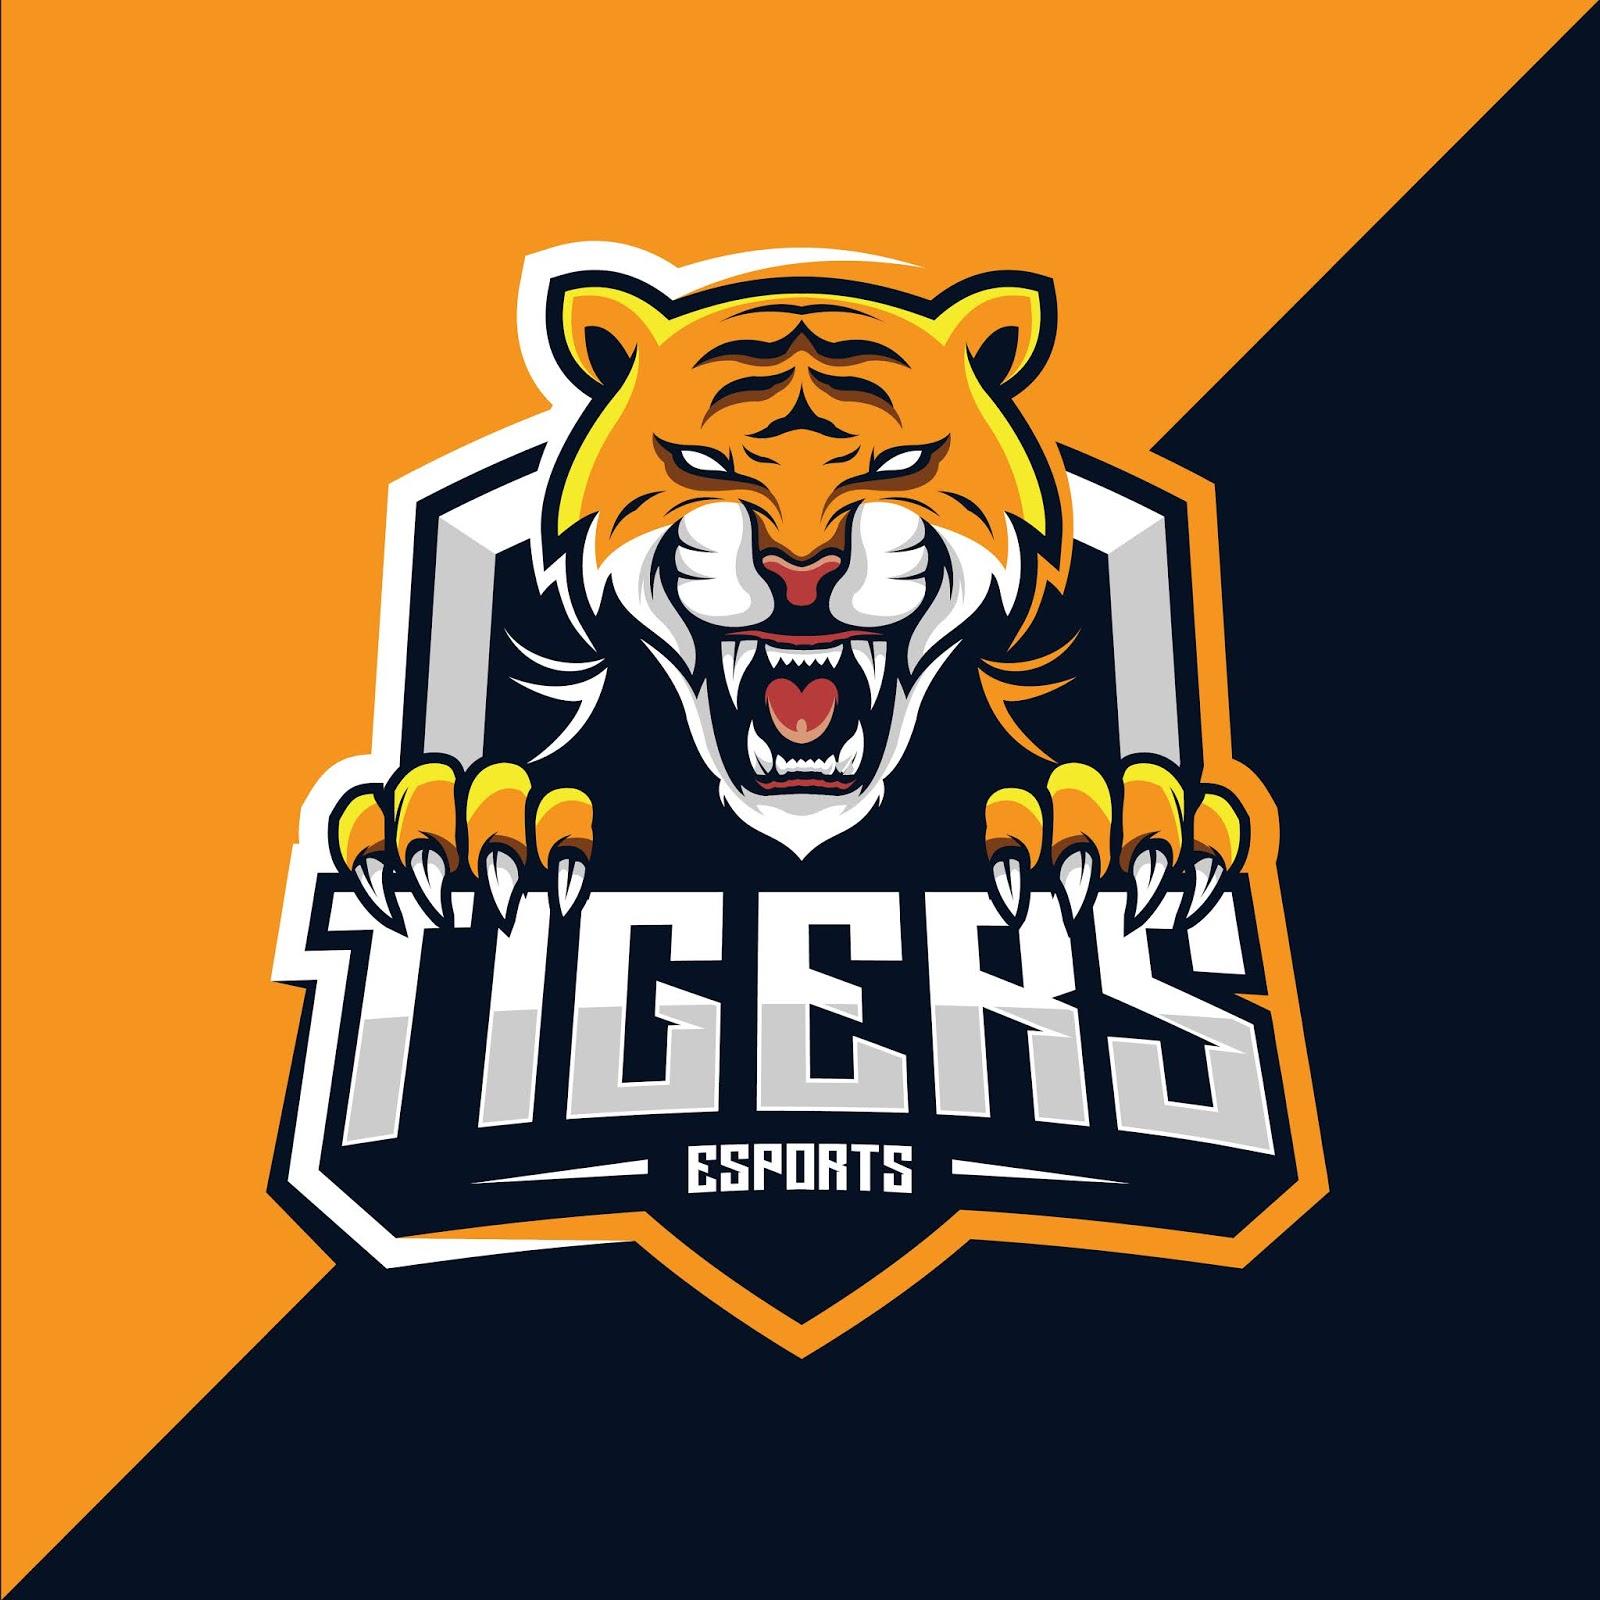 Tiger Mascot Esport Logo Design Free Download Vector CDR, AI, EPS and PNG Formats